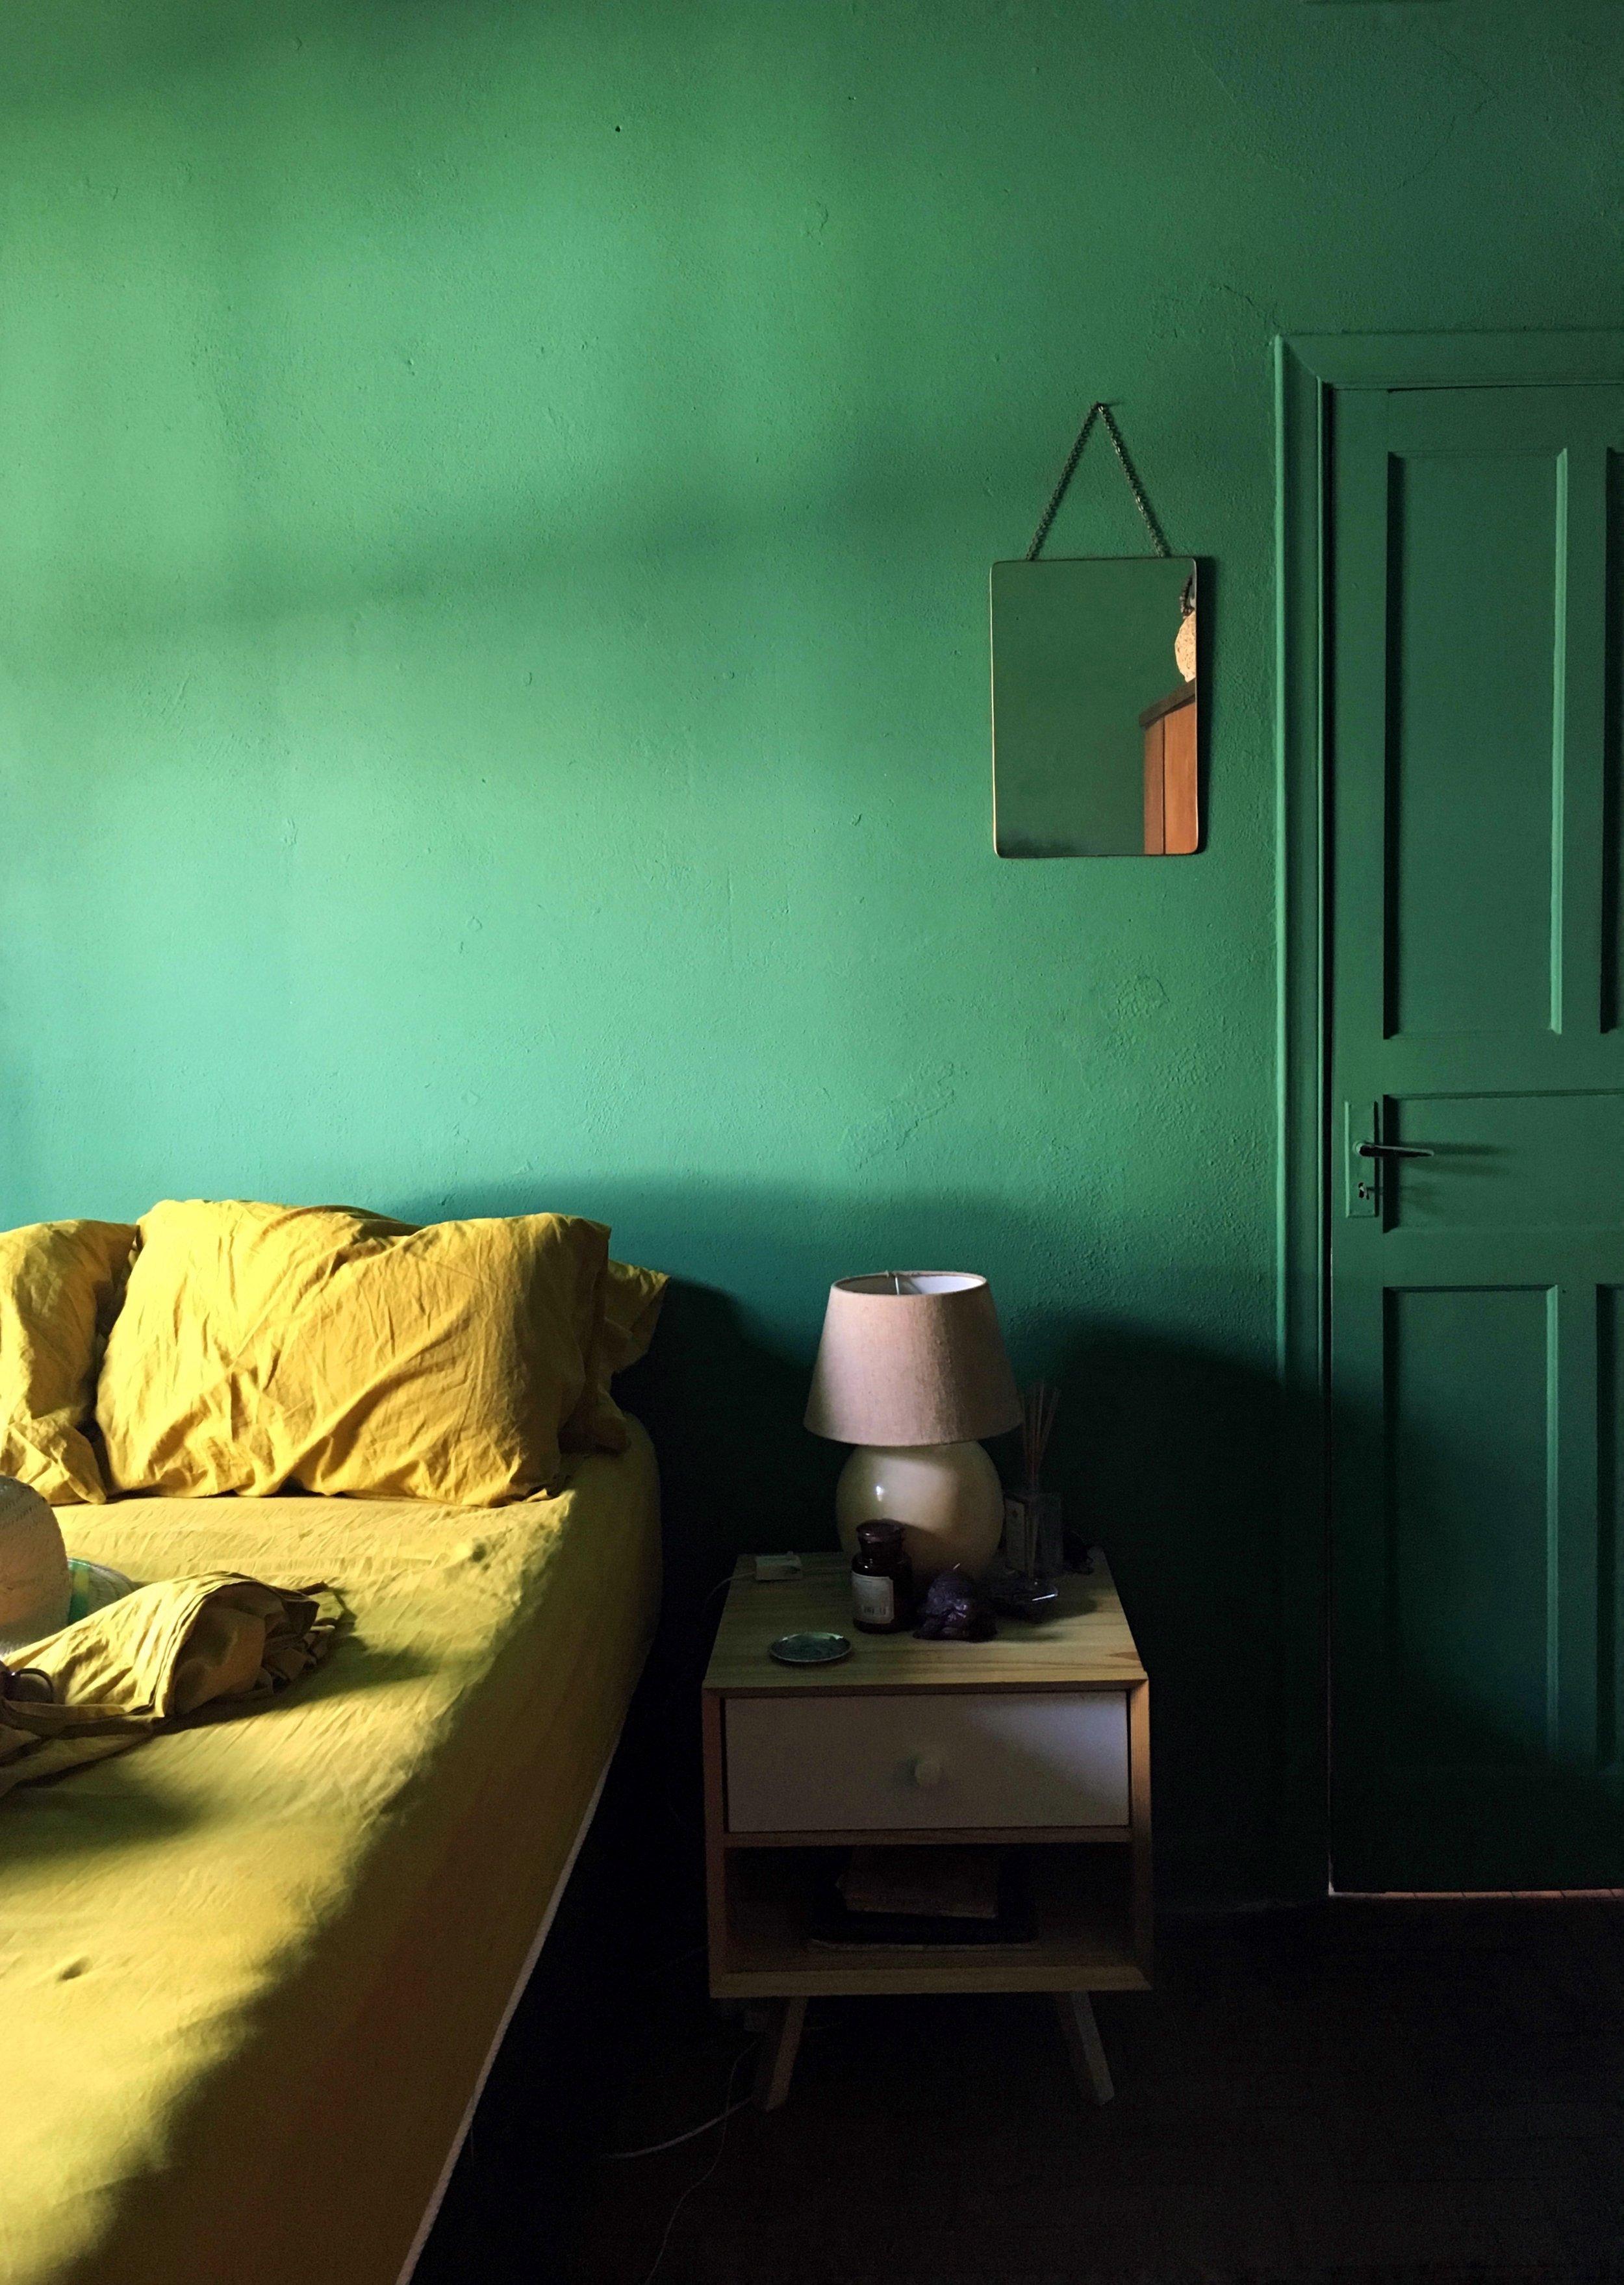 06-new-bedroom.jpg